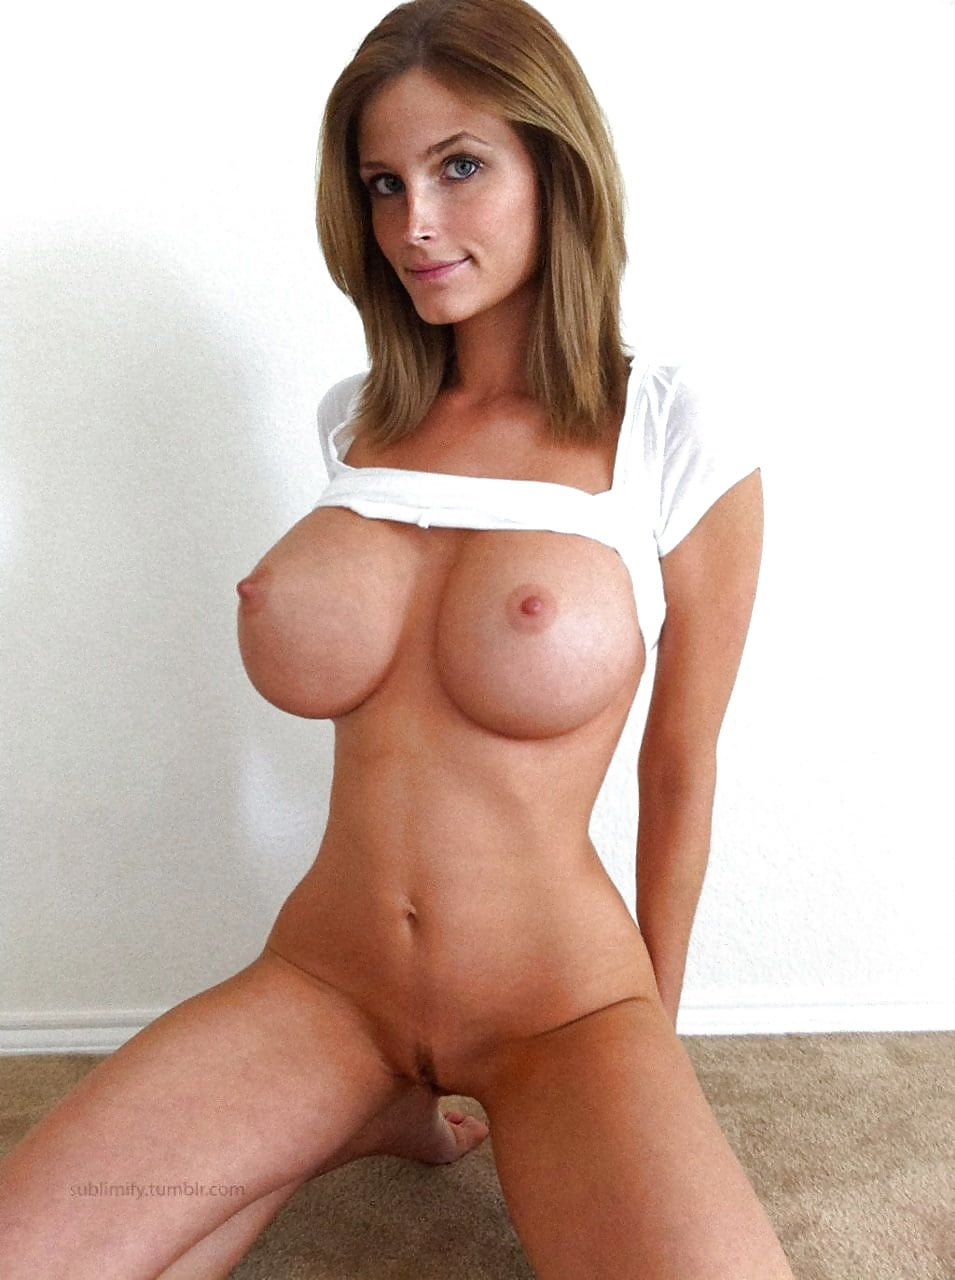 Lesbian threesome girls with fake titties nude